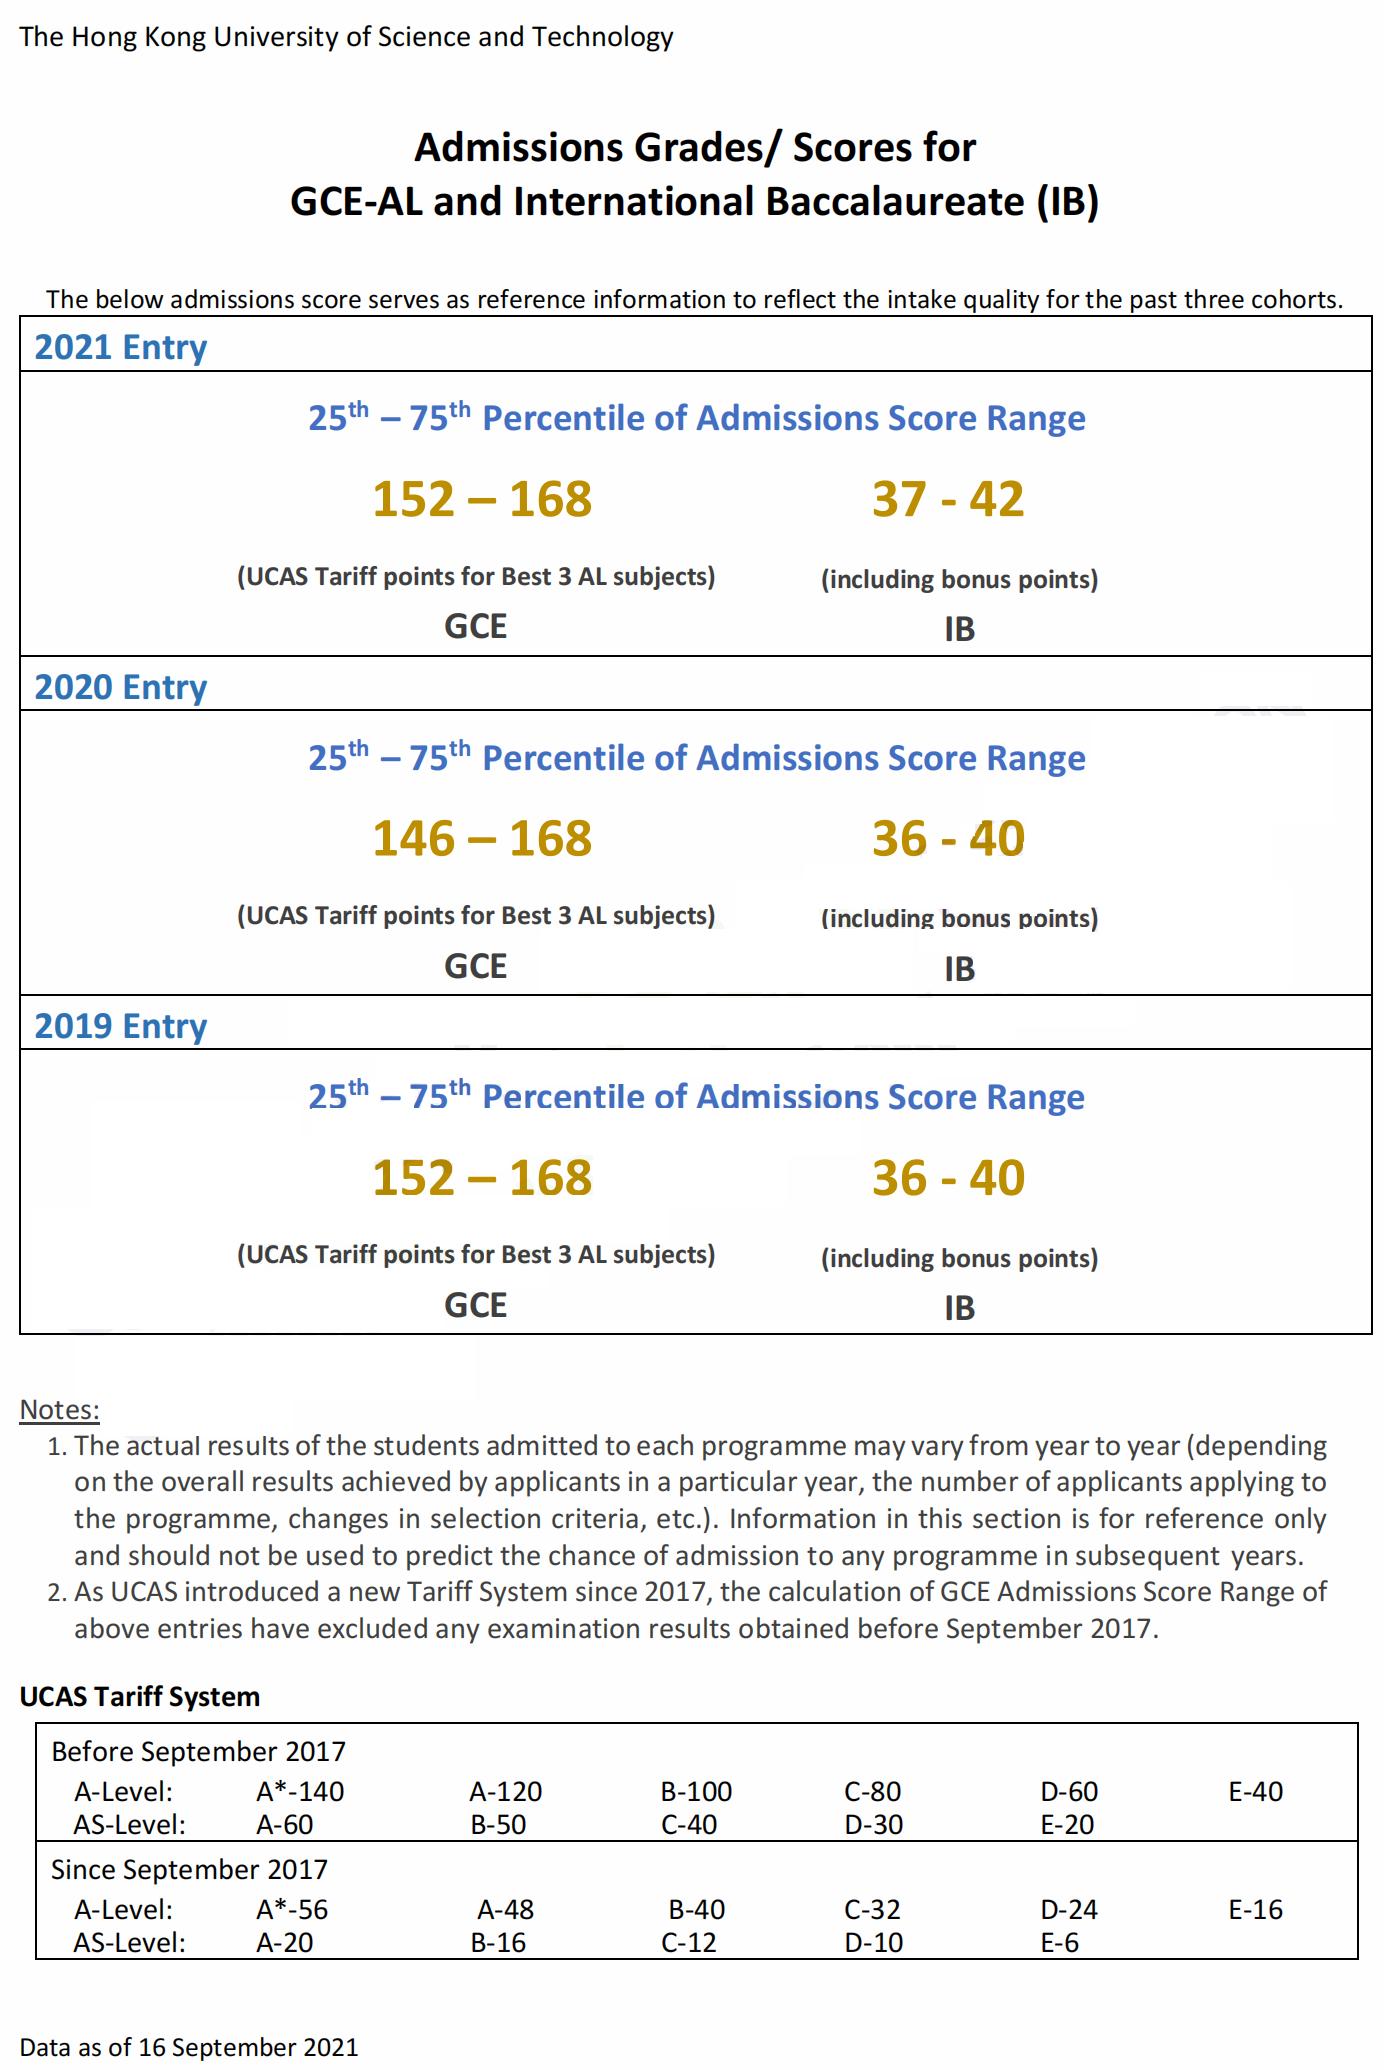 IBDP预估成绩36分高吗,能拿到香港科技大学的offer吗?